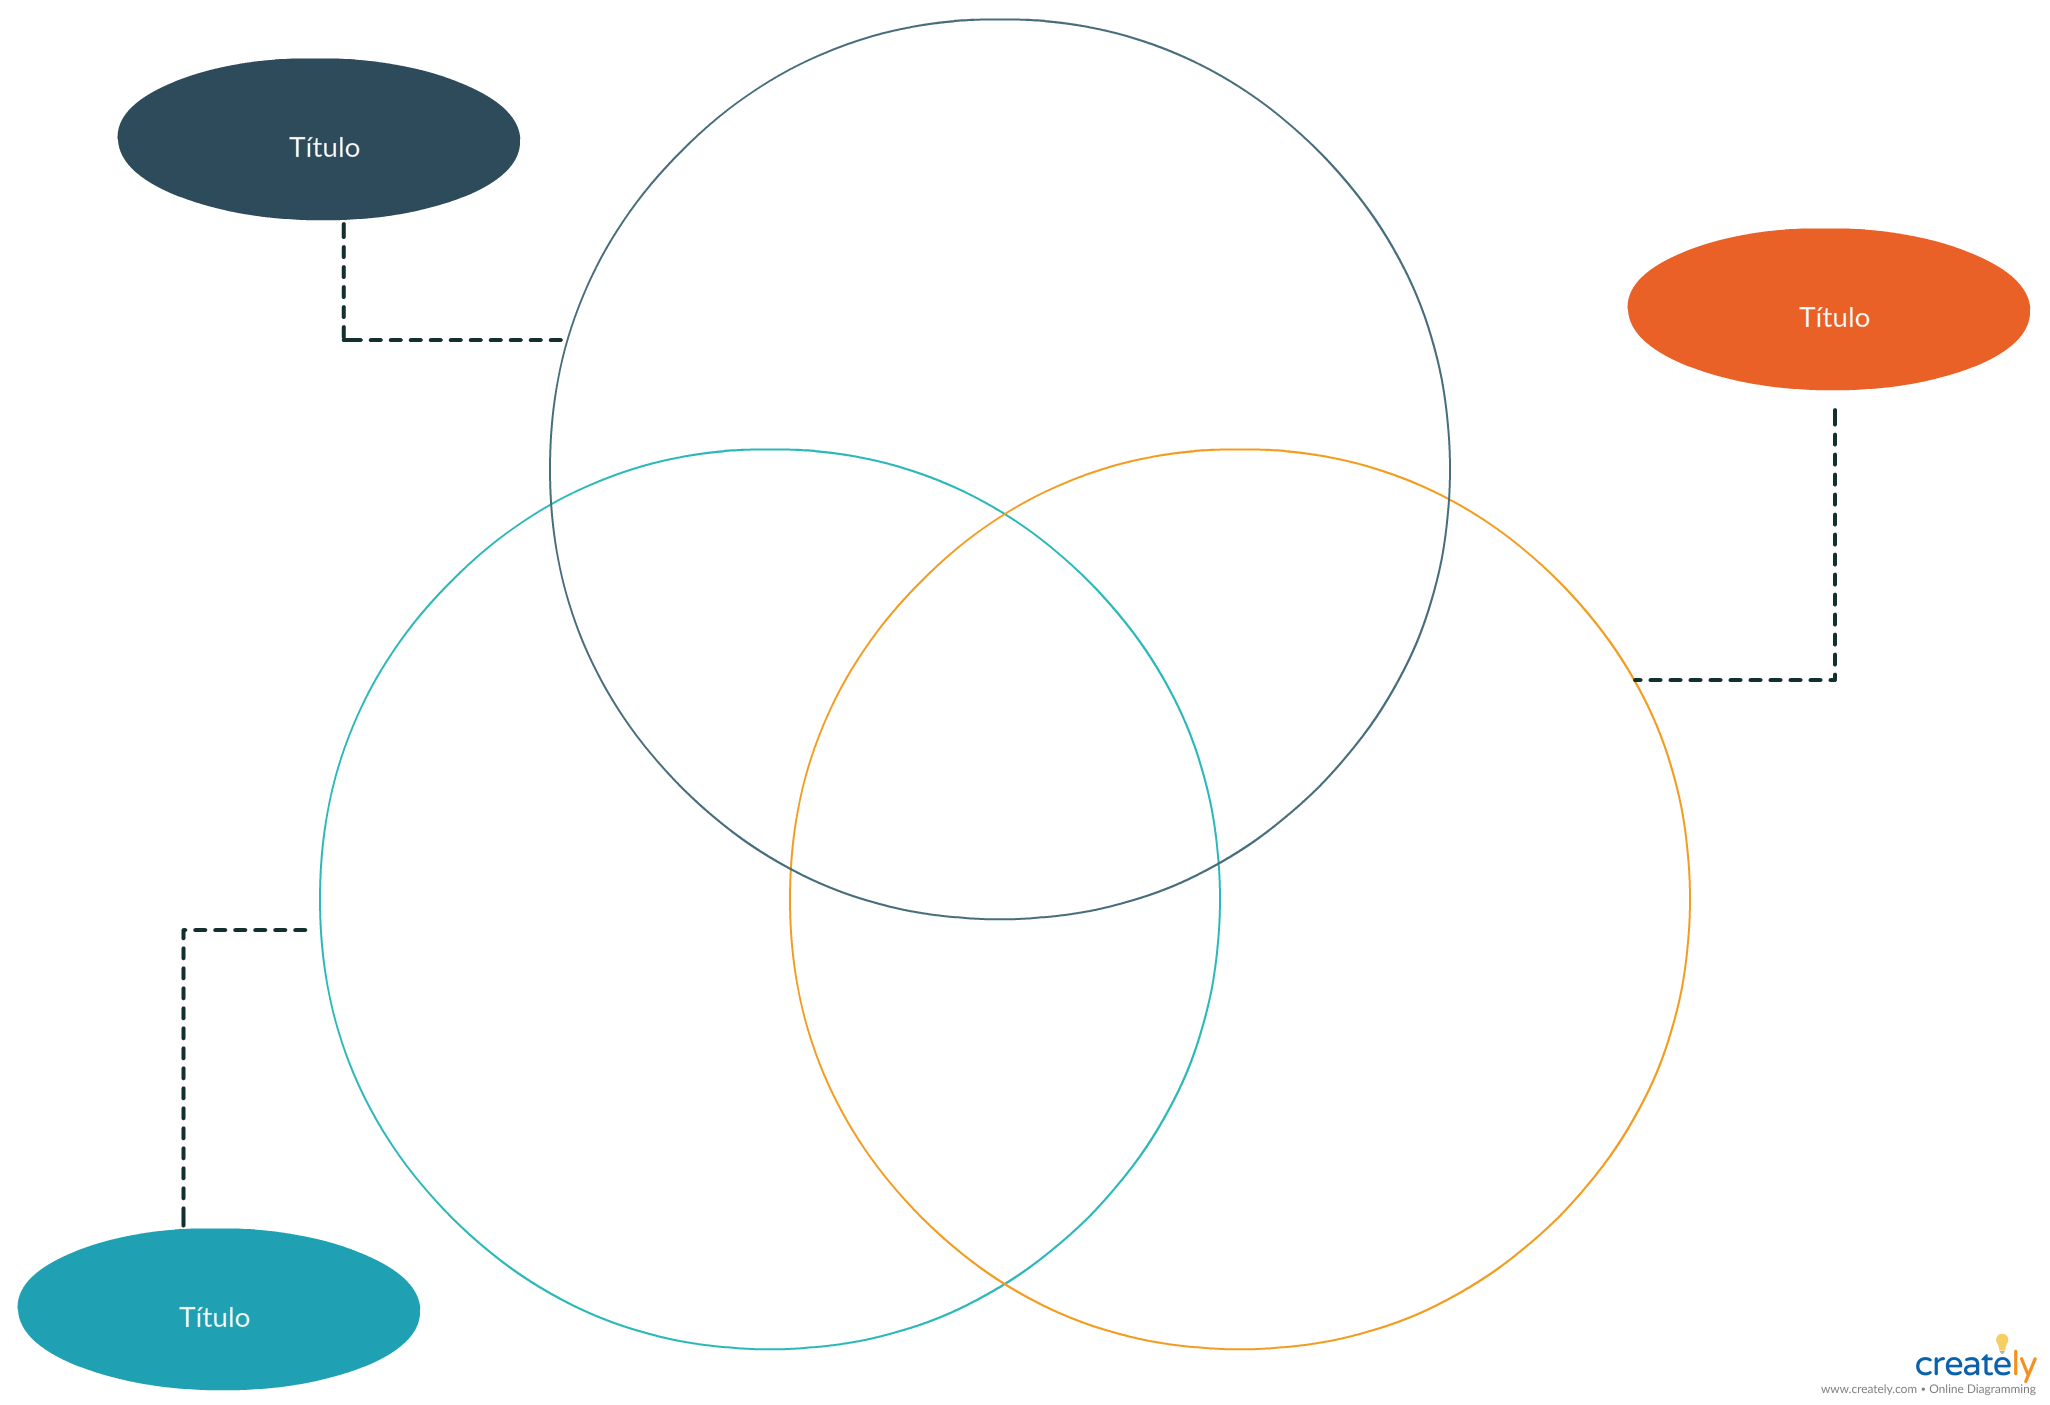 hight resolution of 3 circulo diagrama de venn para descargar o modificar en linea puedes editar esta plantilla